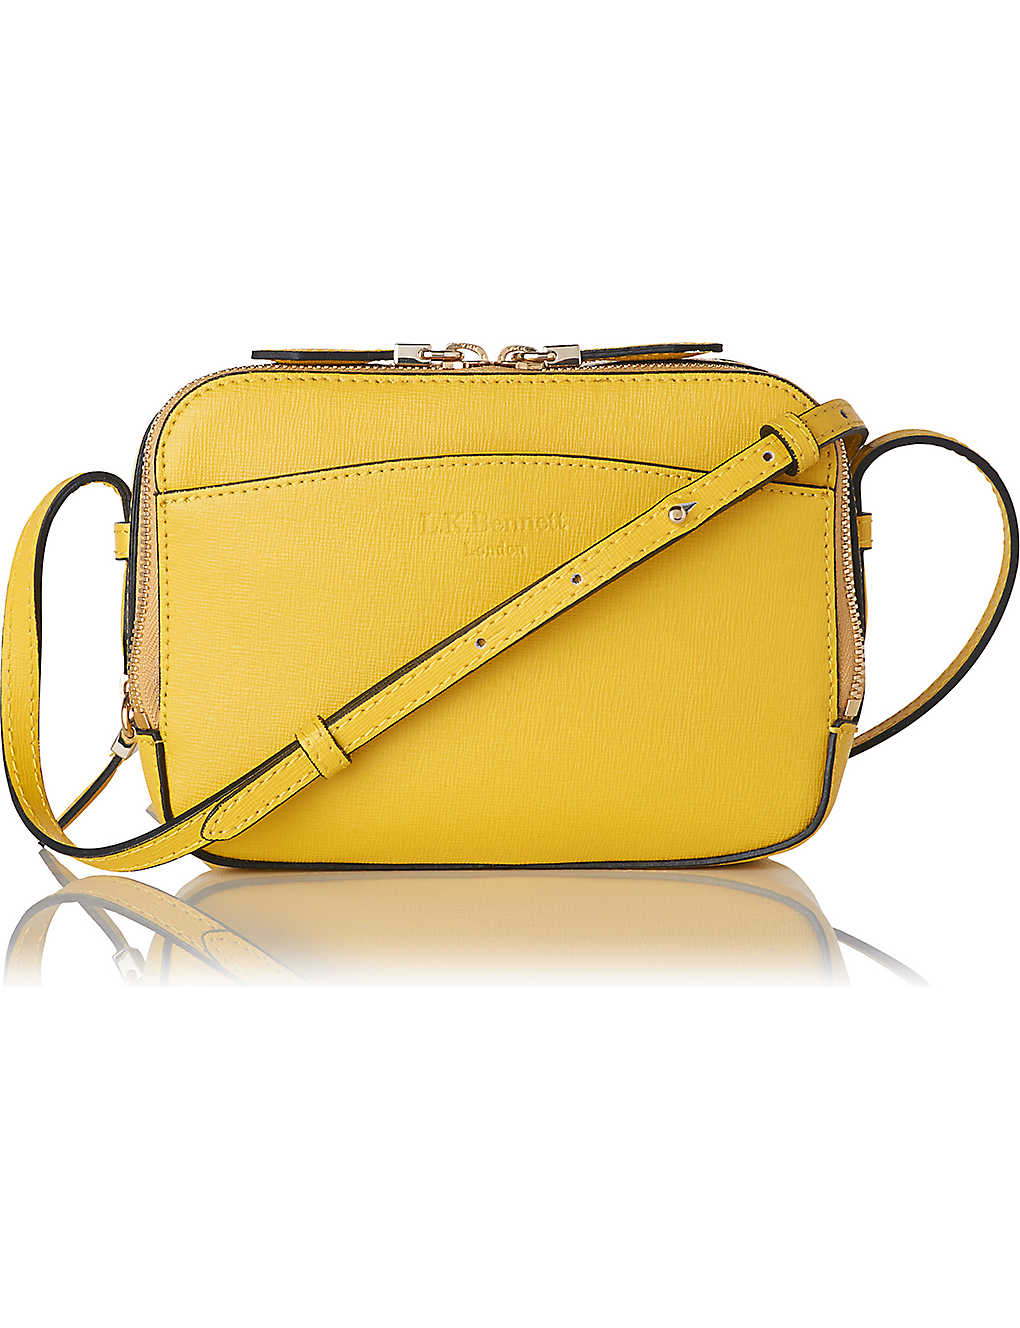 7bf6e5fc7492 LK BENNETT - Mariel leather cross-body bag | Selfridges.com